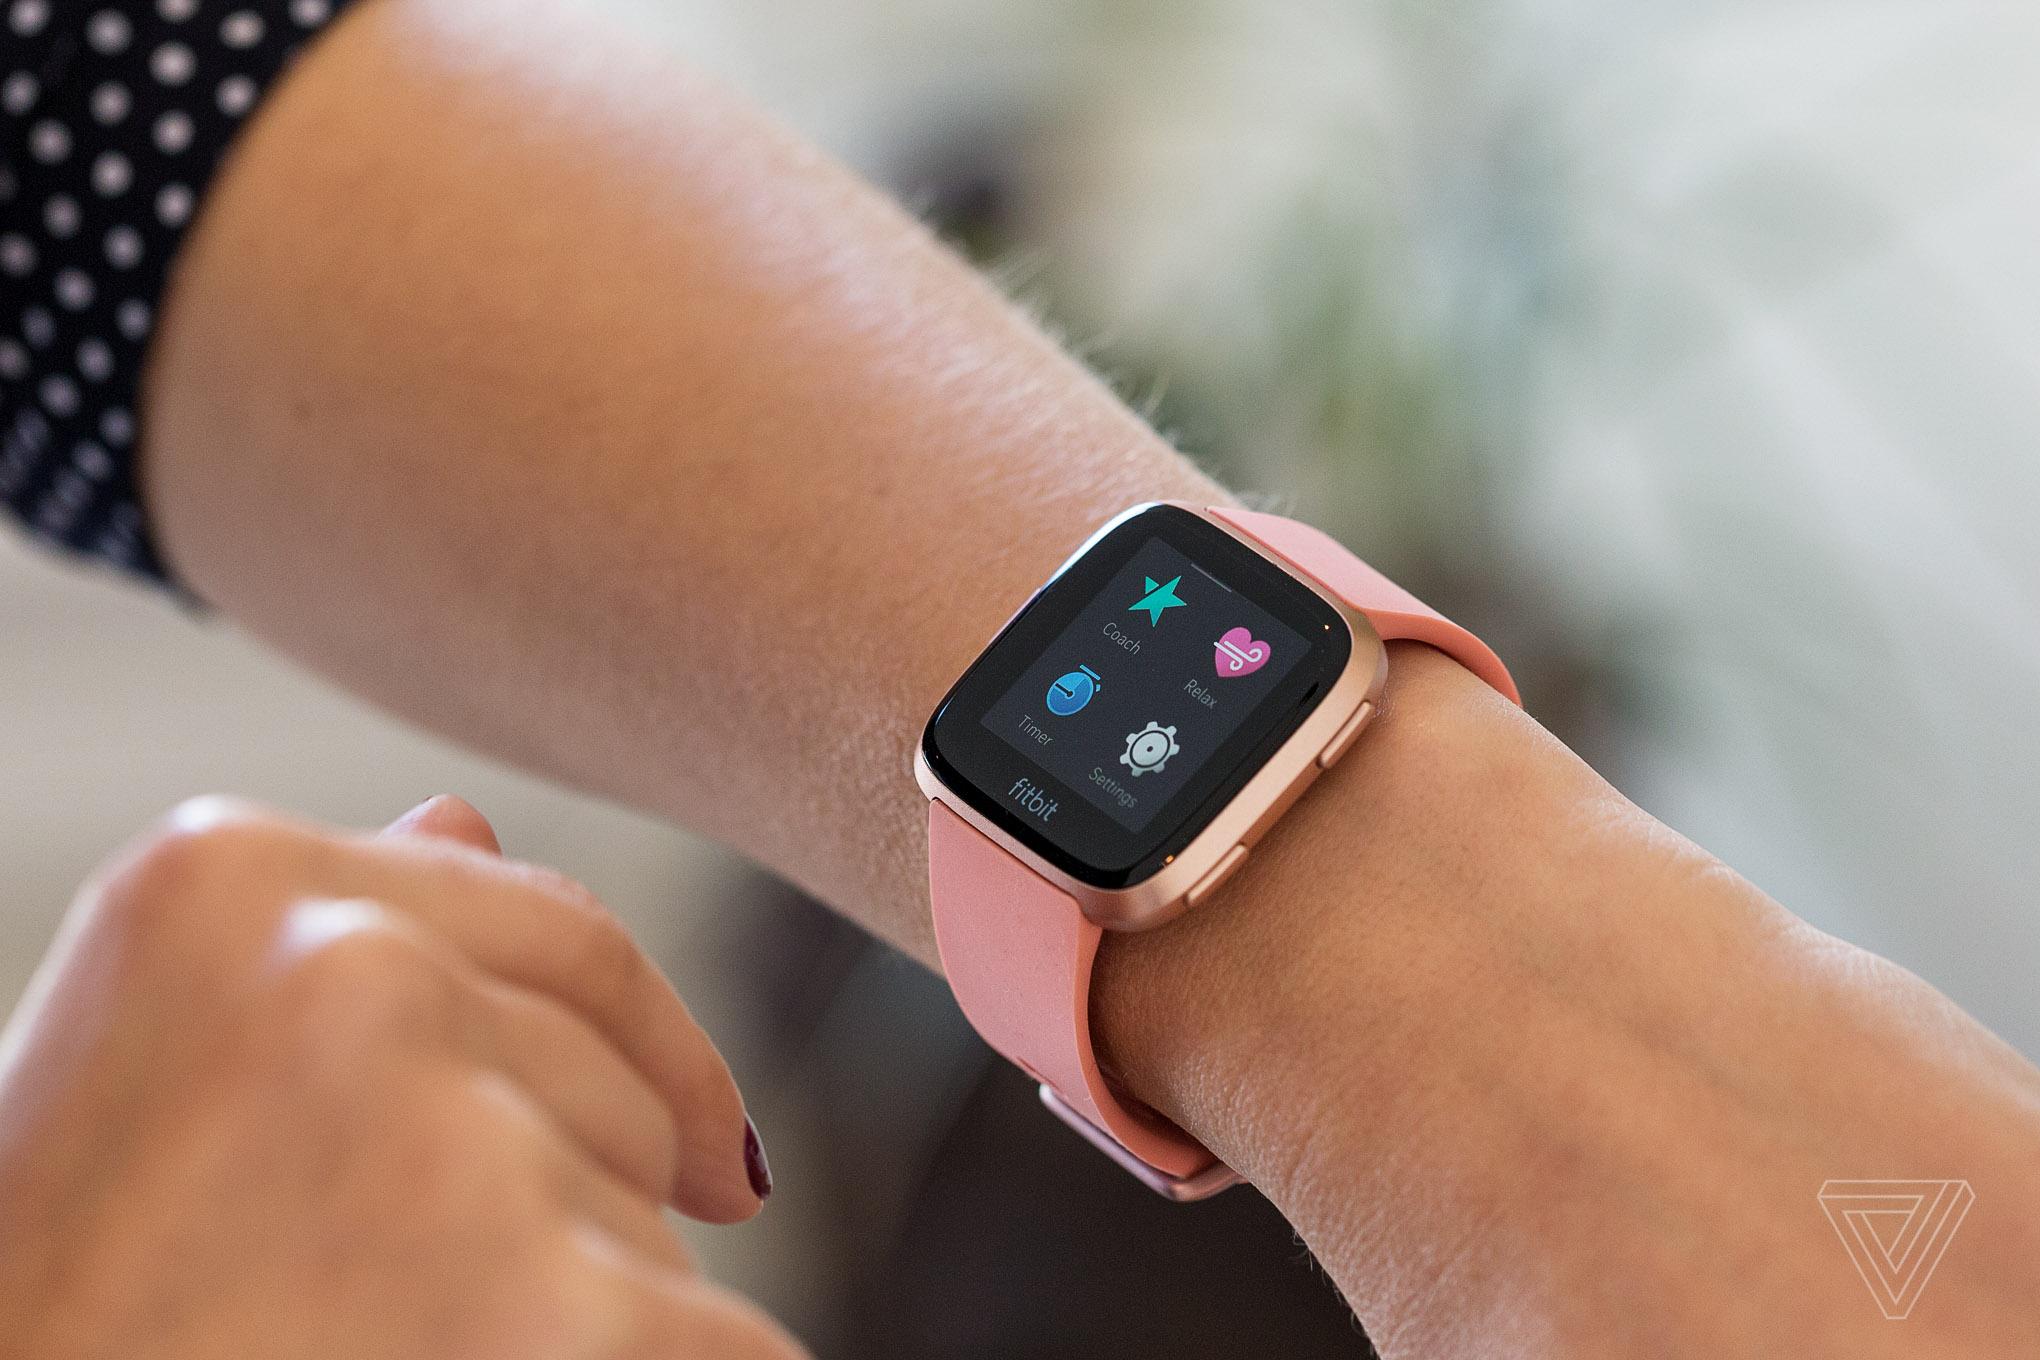 Fitbit's Versa is its best smartwatch yet - The Verge